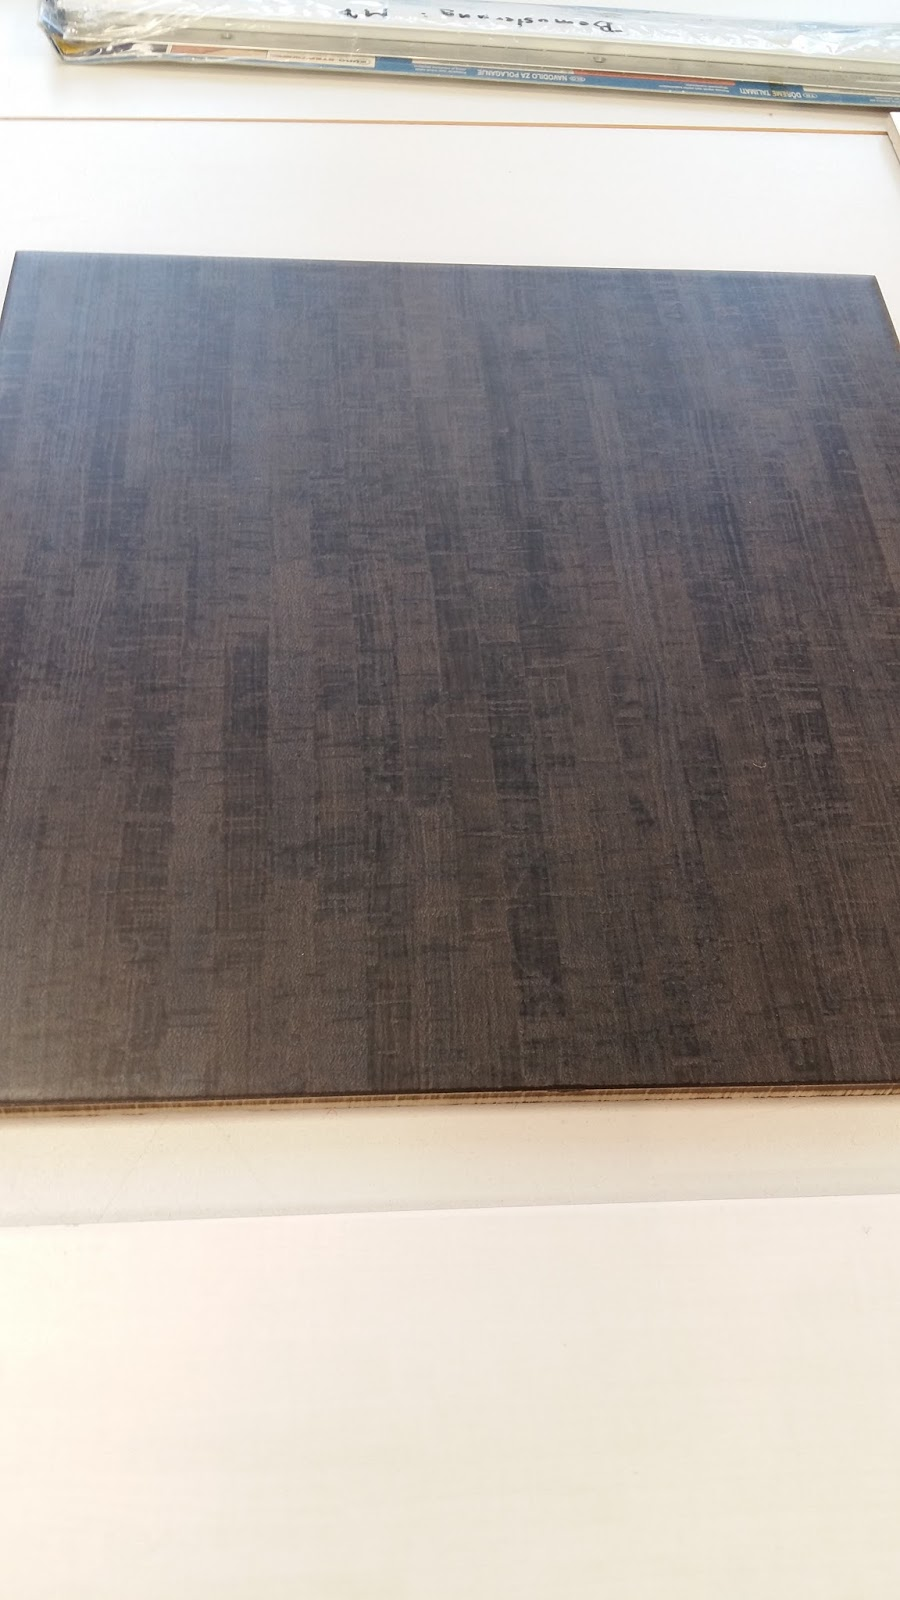 Inredning laminat klinker : Unser Prohaus Profamily 148: Bemusterung